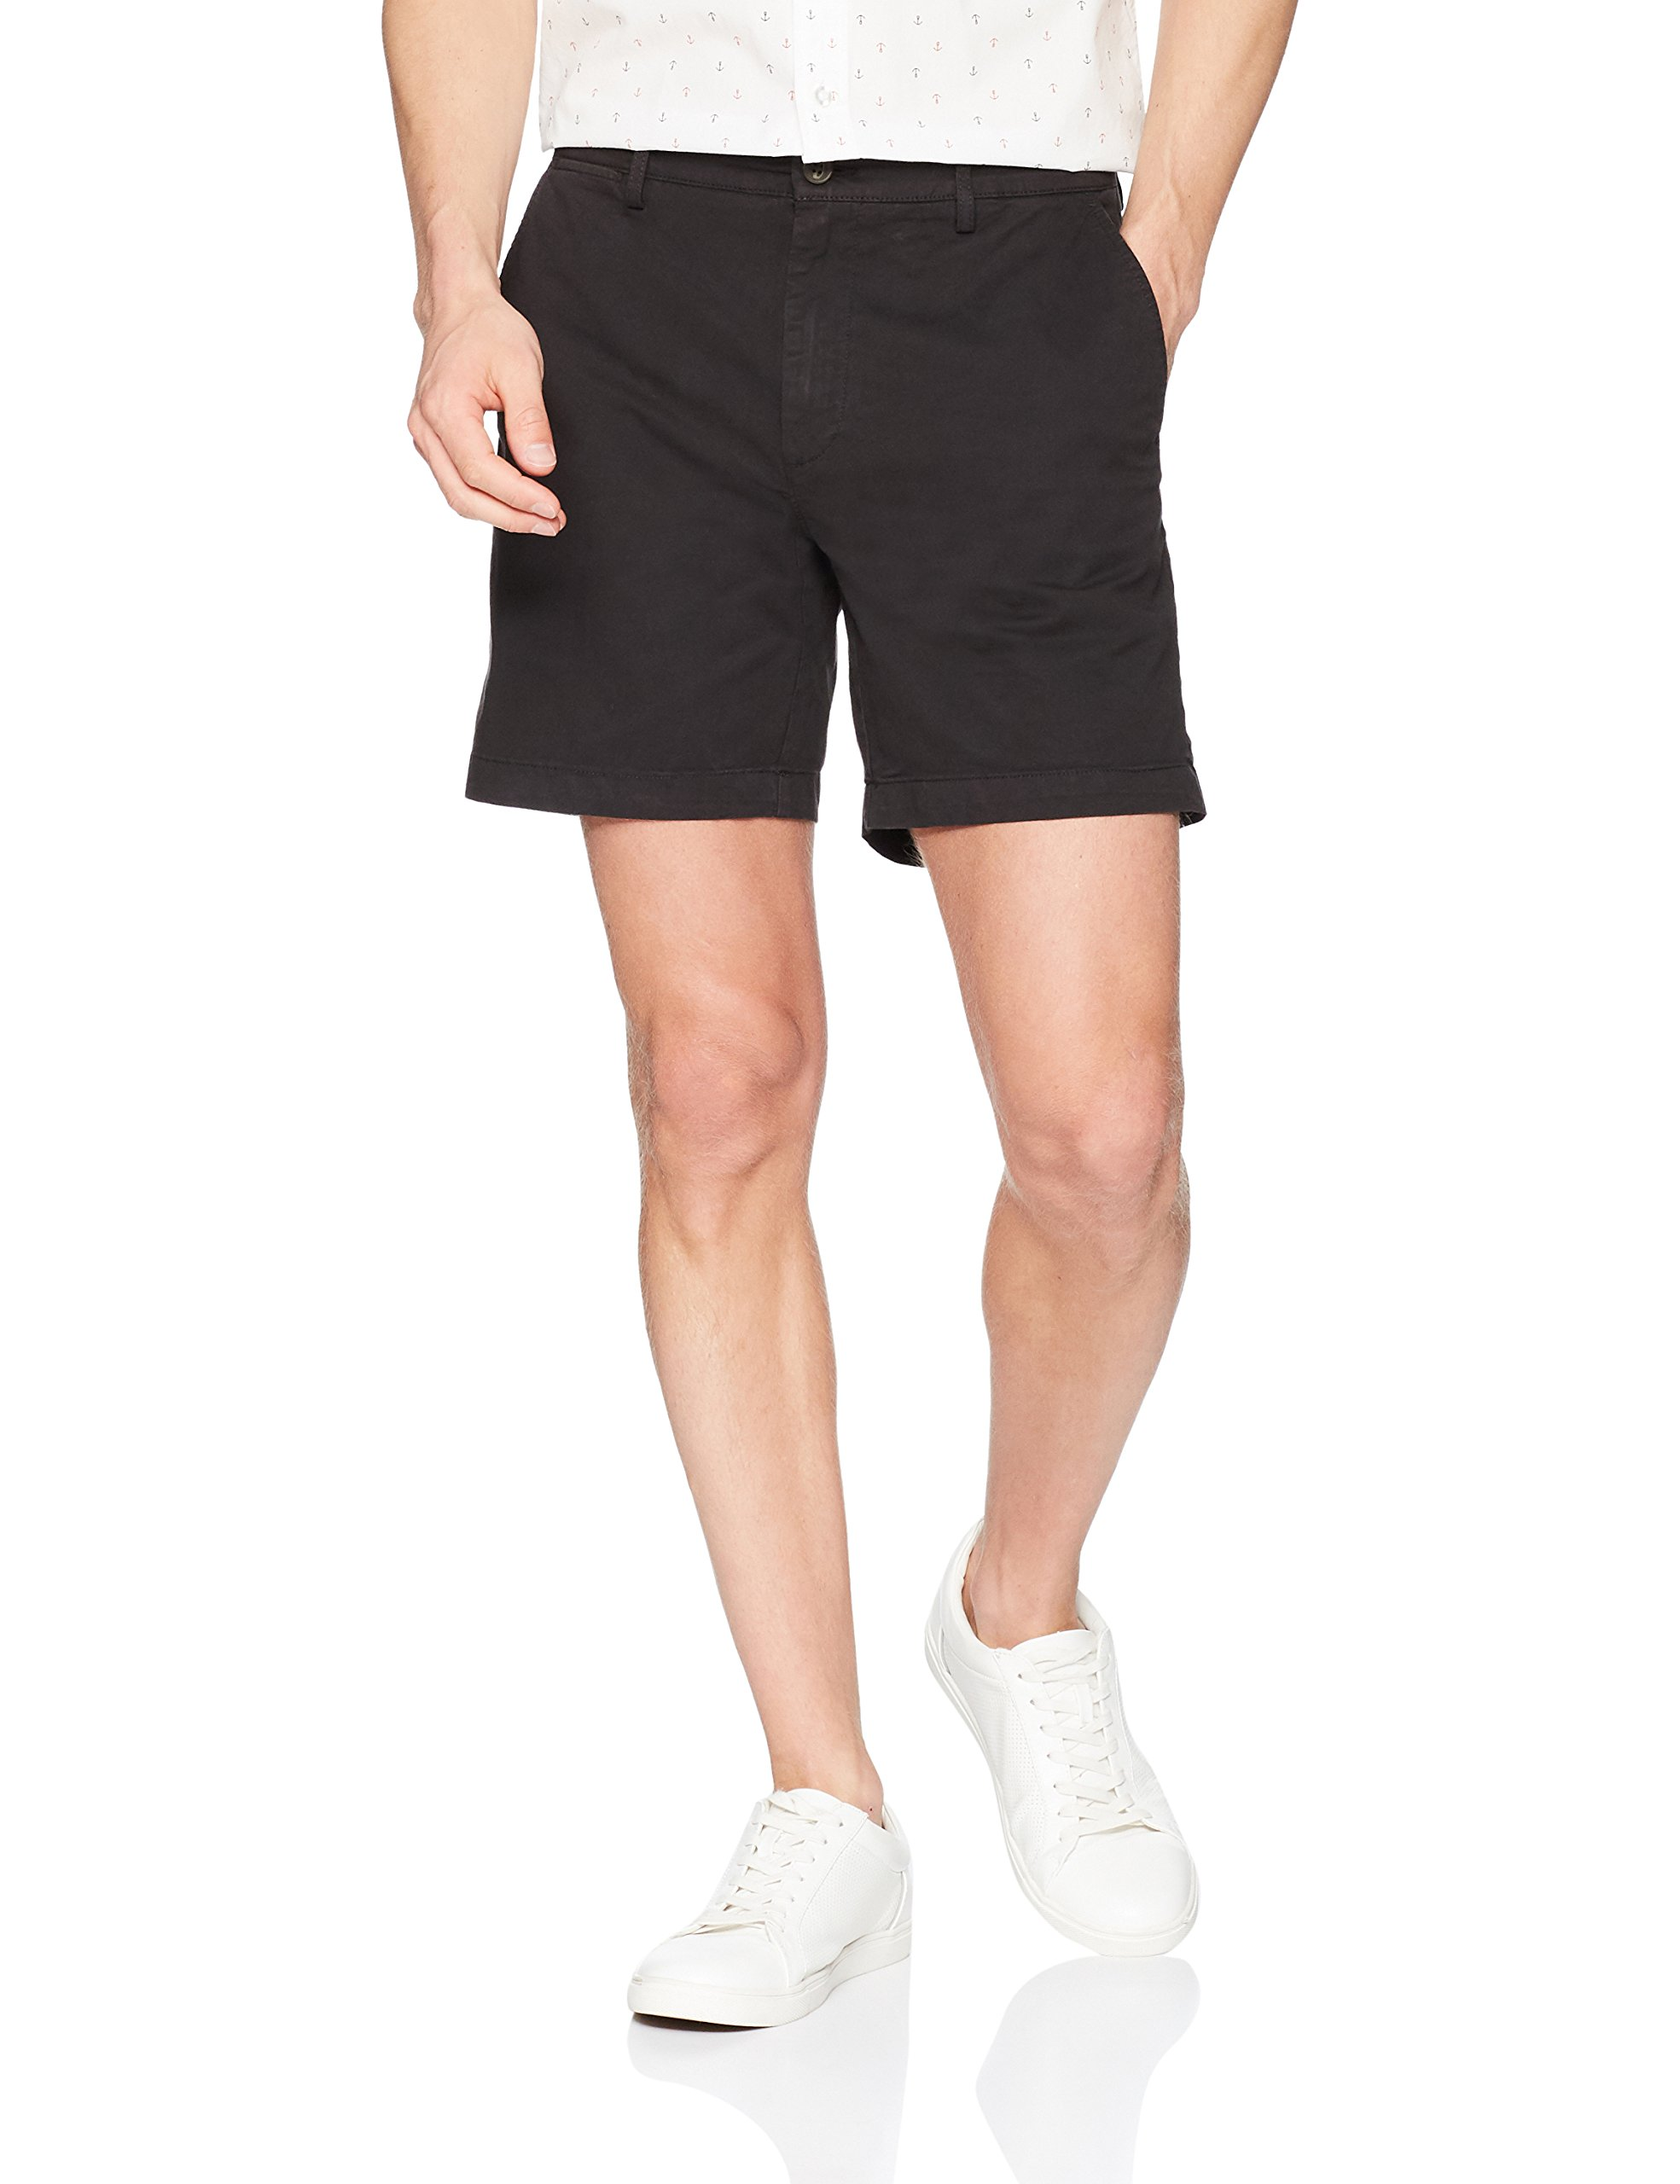 Goodthreads Men's 7'' Inseam Flat-Front Stretch Chino Short, Black, 32